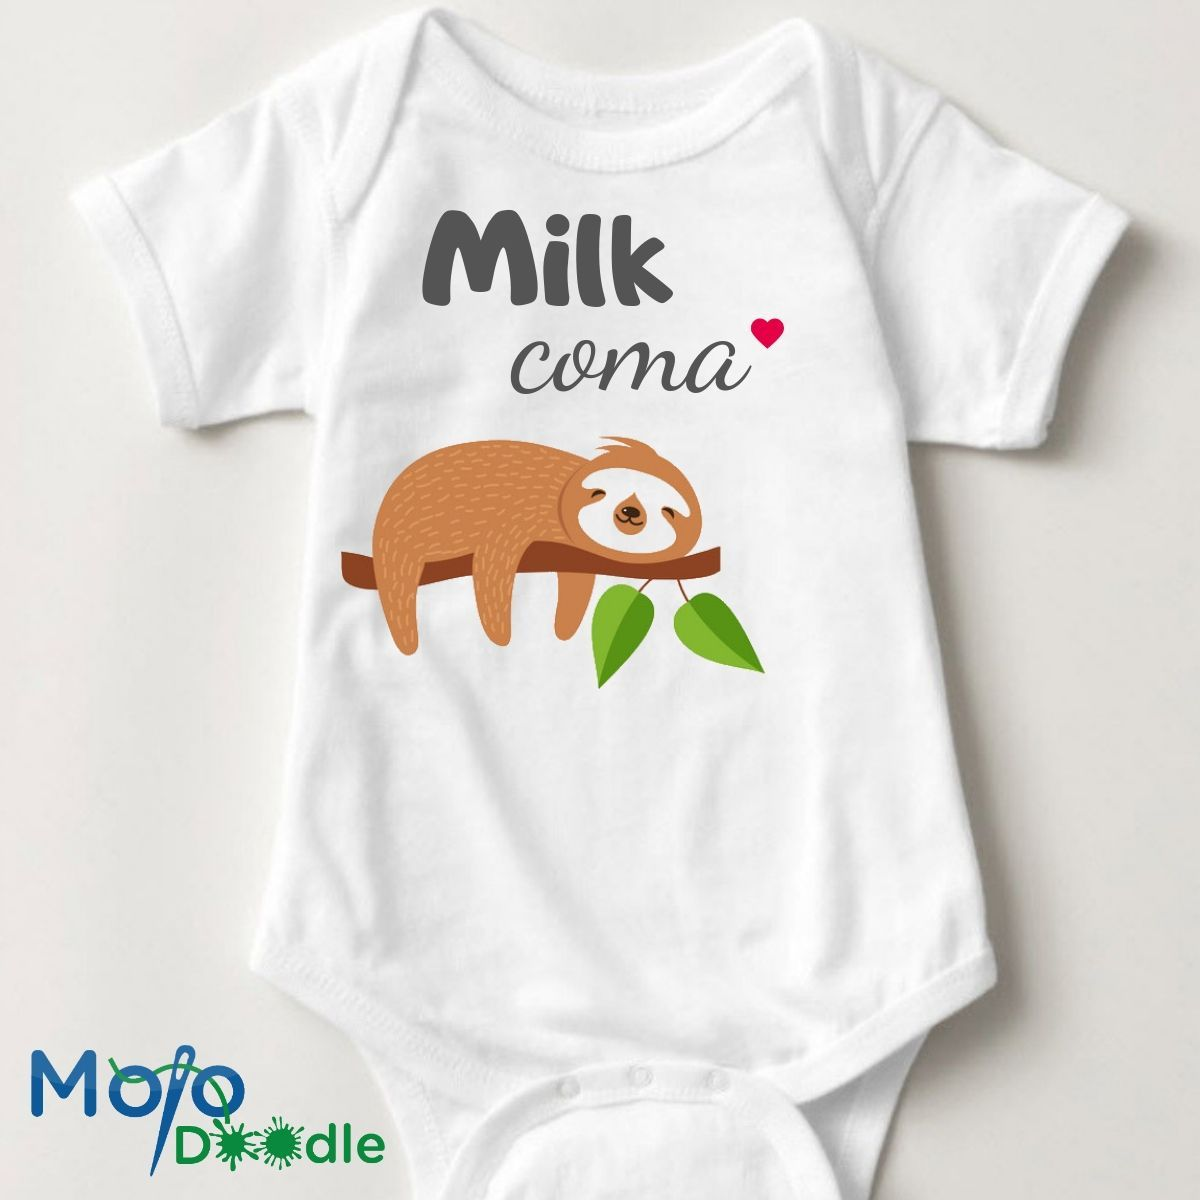 Milk Coma Baby Bodysuit Baby Shower Gift New Mom Cute Baby New Mom Gift Cute Baby Gift Baby Cute Baby Clothes Custom Baby Onesies Cute Baby Onesies